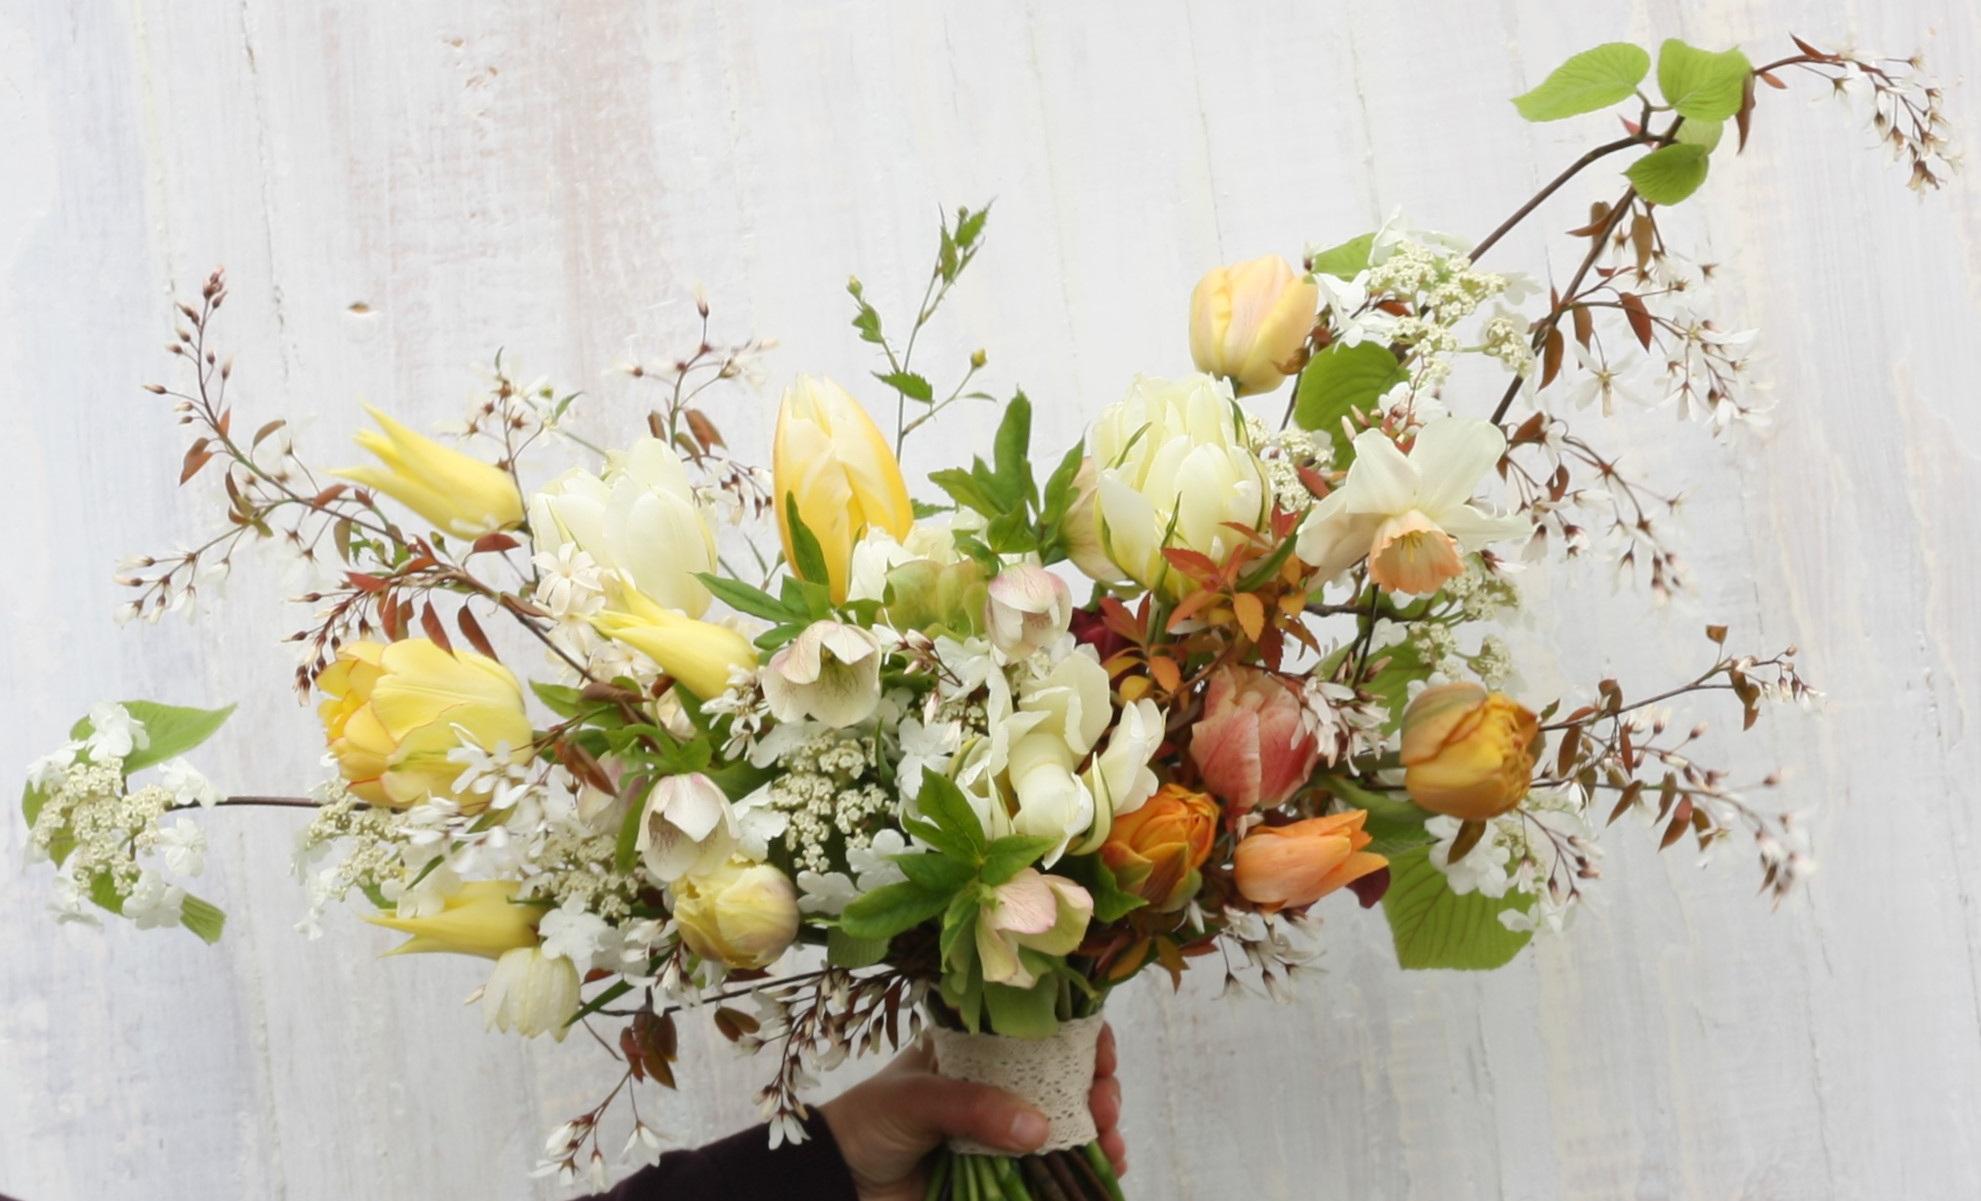 Spring+Bridal+Bouquet+from+Nova+Scotia%27s+Hedgerow+Flower+Company